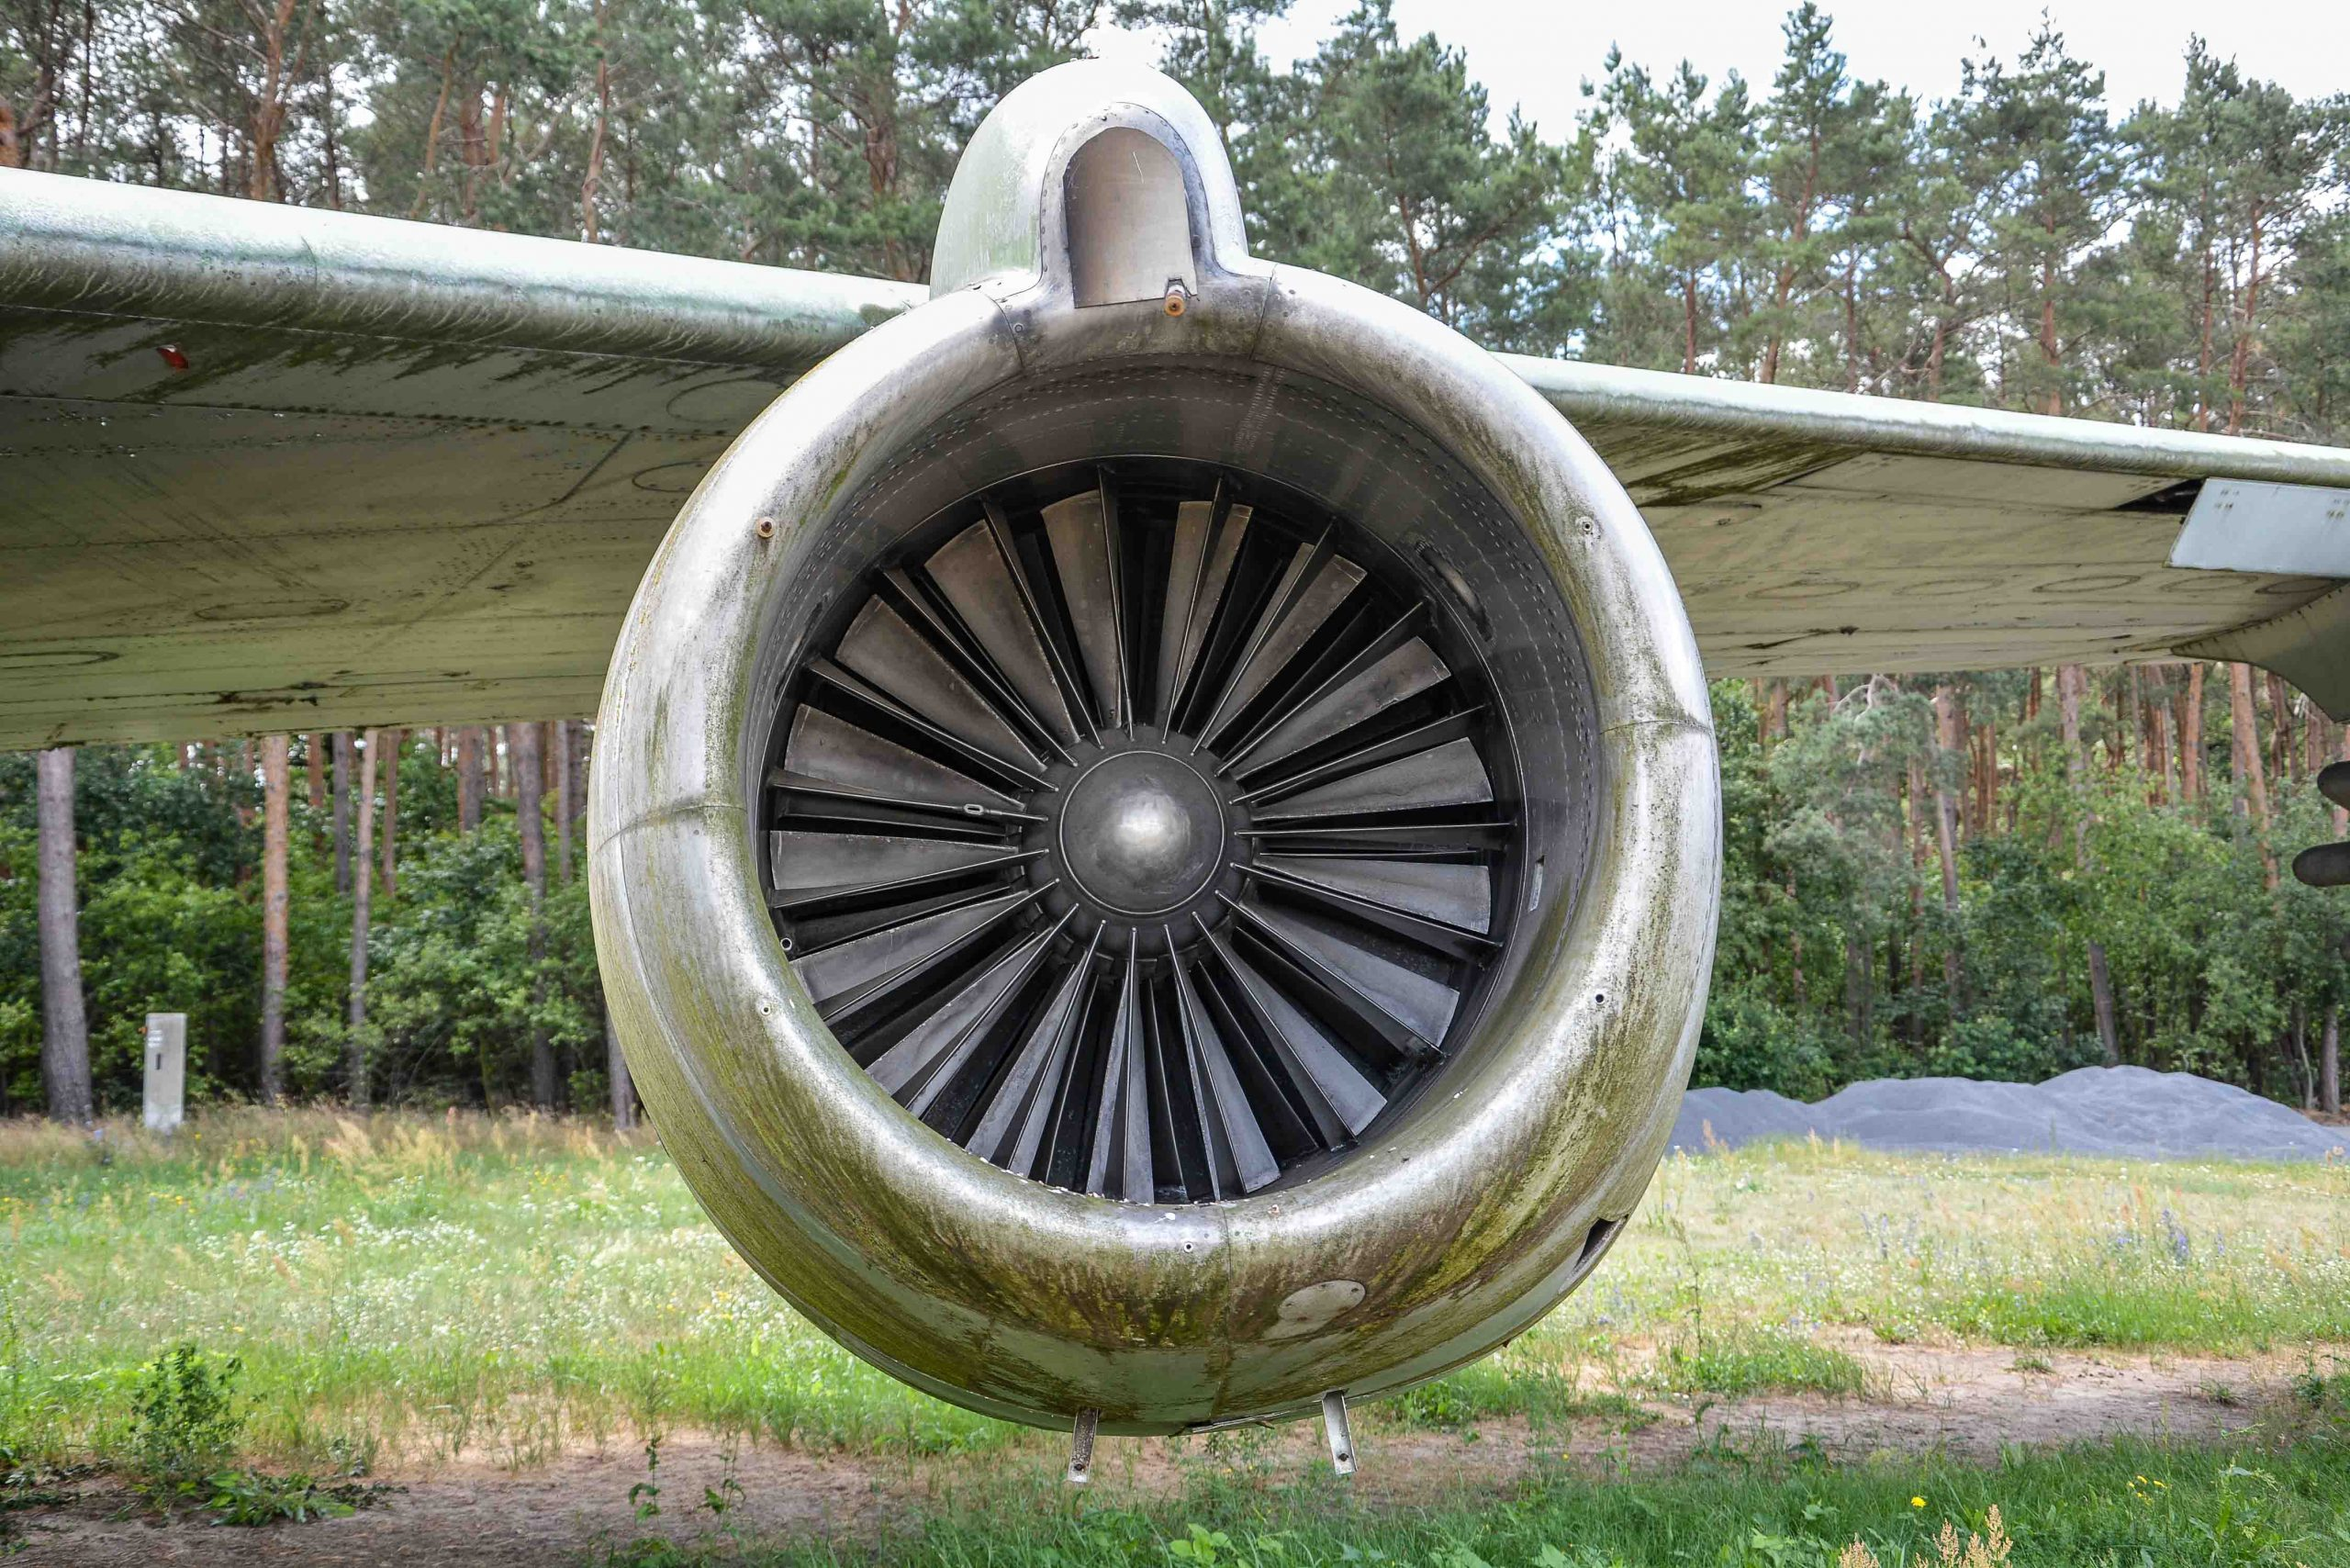 turbine abandoned boeing 707 tegel txl flughafen airport berlin germany deutschland